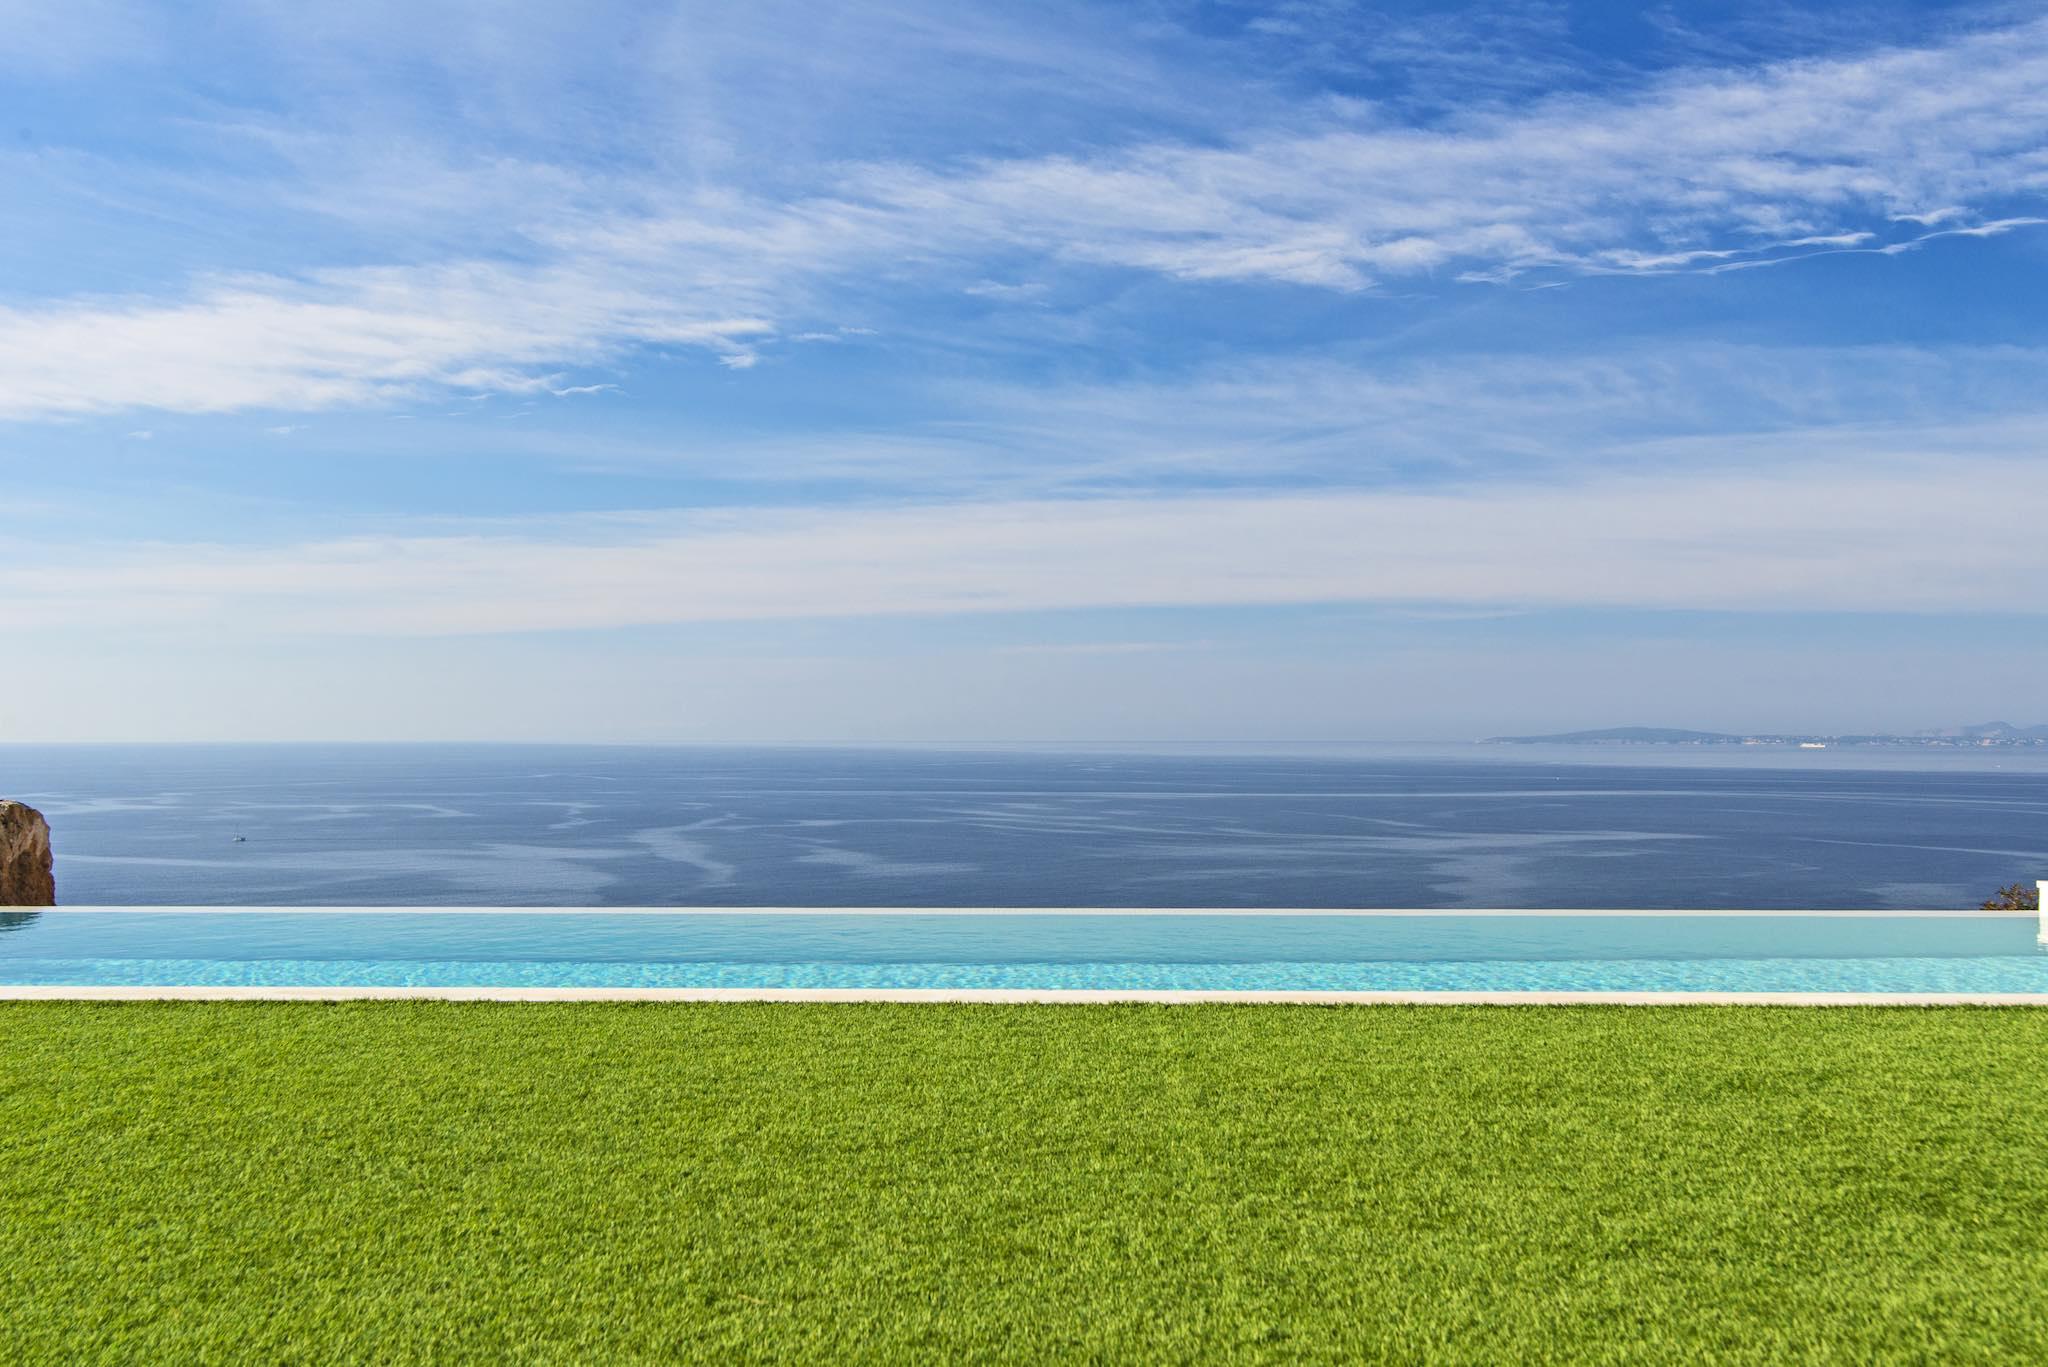 Engel & Völkers Ultra modern villa with sea views in south Mallorca (Sa Torre).  €3.5M